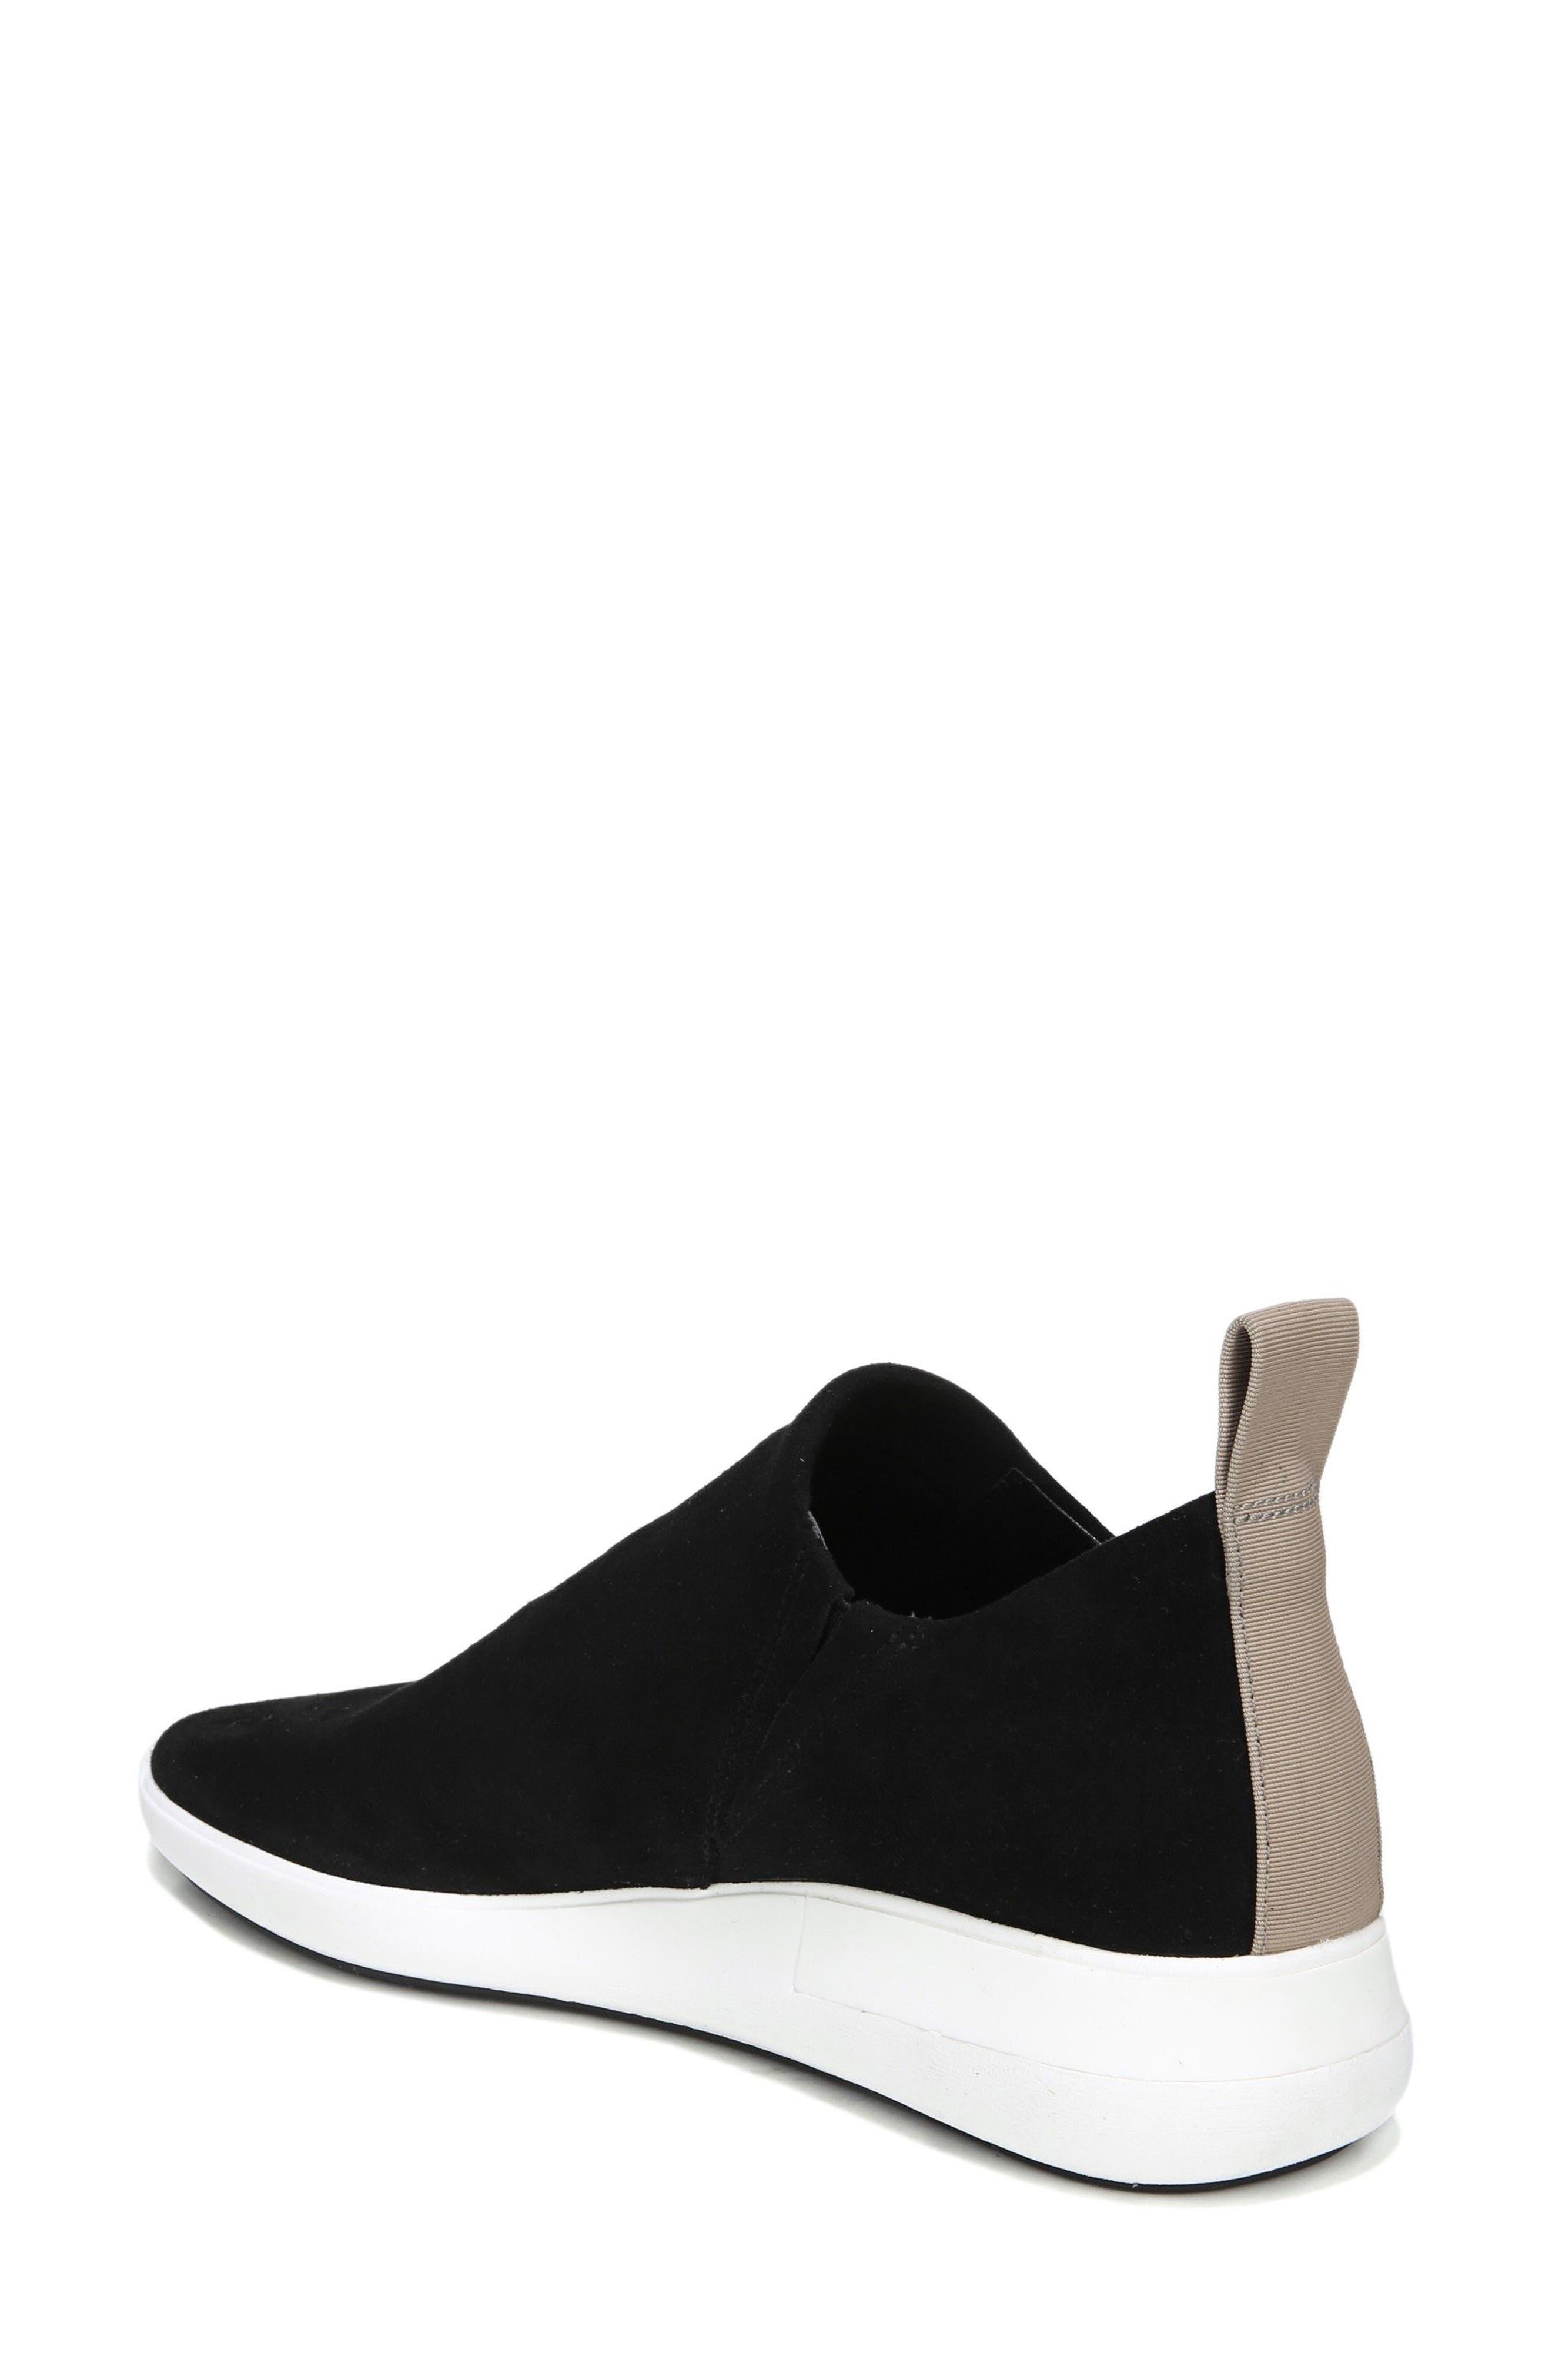 VIA SPIGA, Marlow Slip-On Sneaker, Alternate thumbnail 2, color, BLACK SUEDE